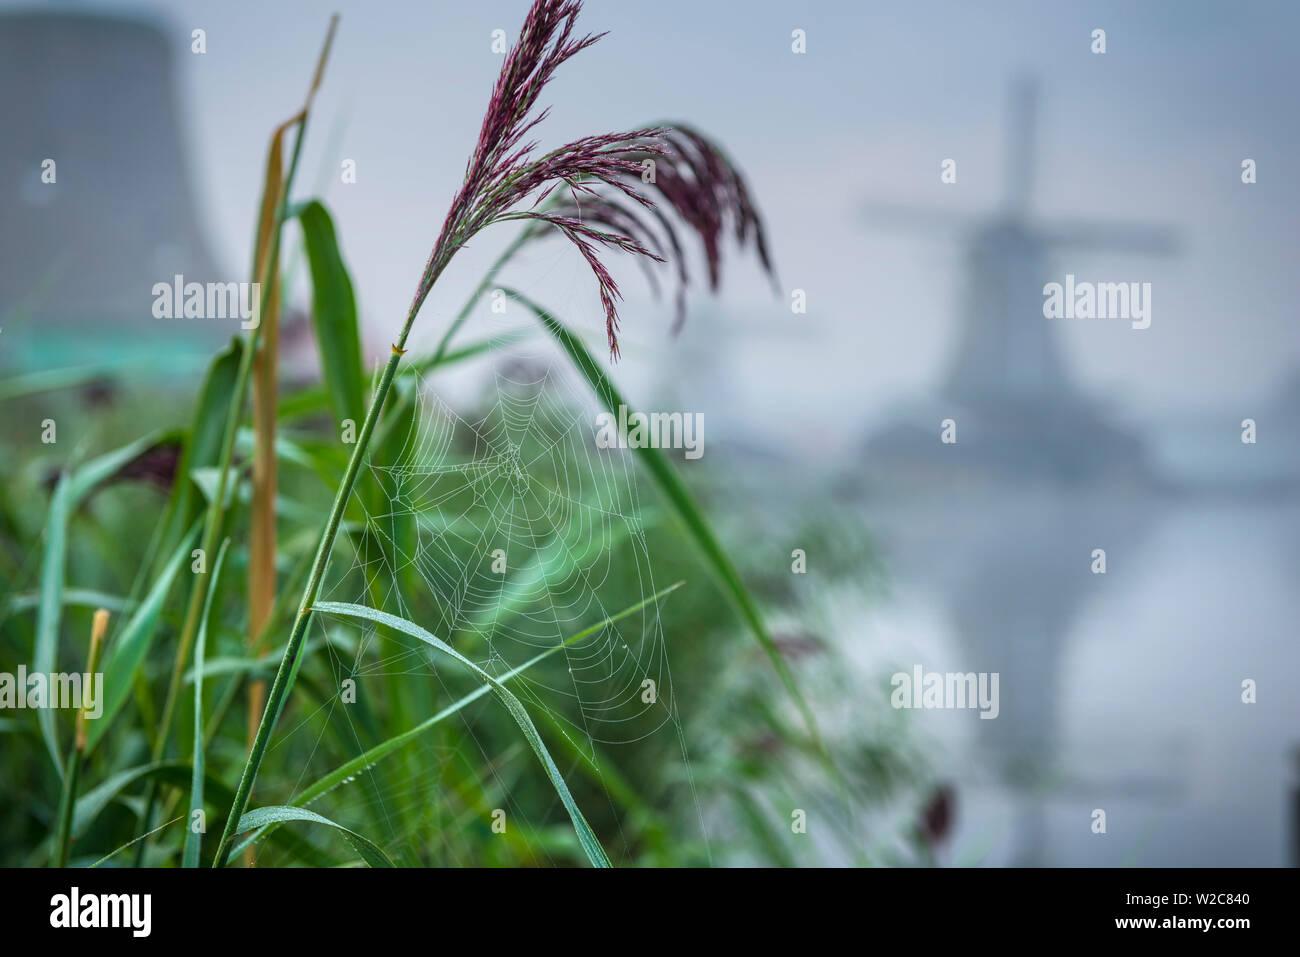 Netherlands, North Holland, Zaandam, Zaanse Schans, Windmills - Stock Image